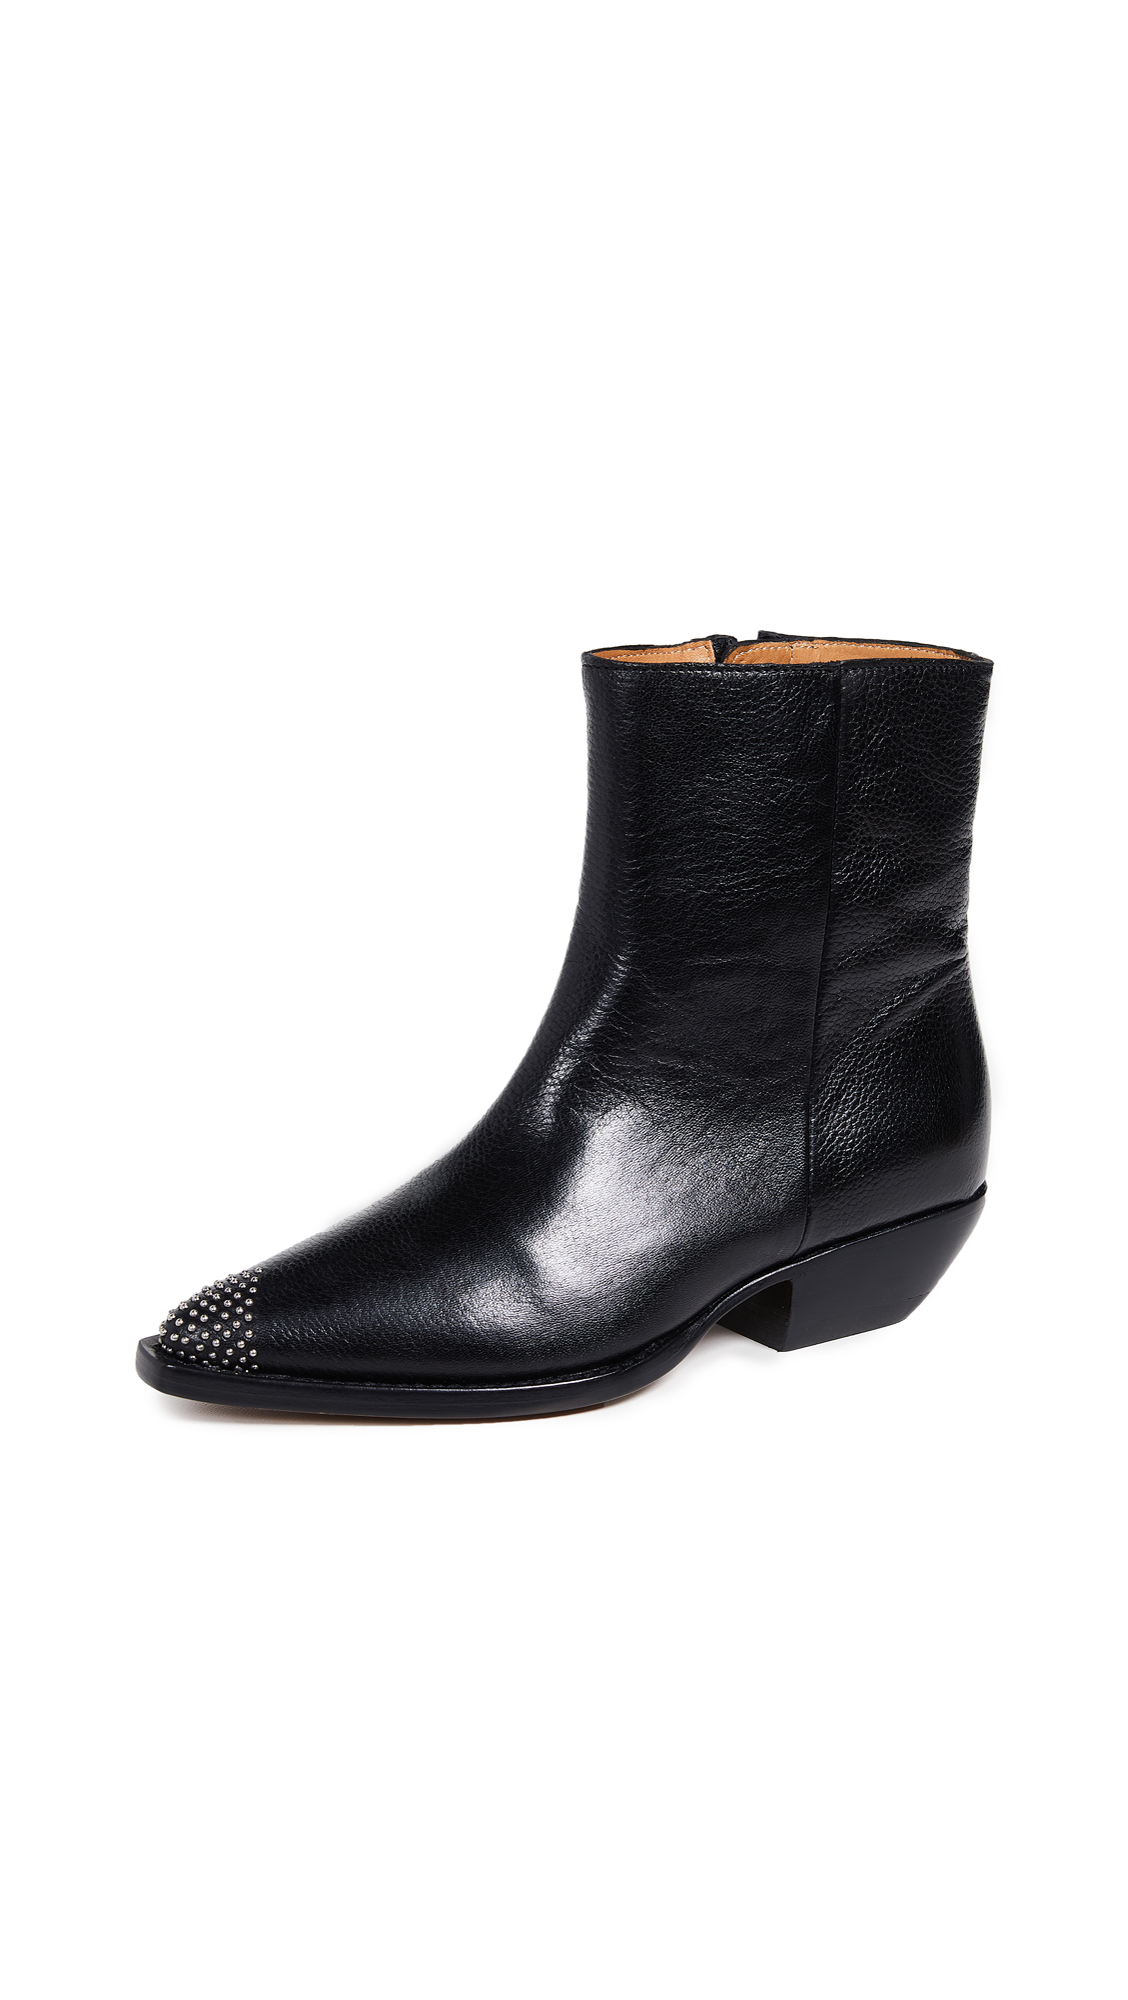 IRO Santiago Boots - Black